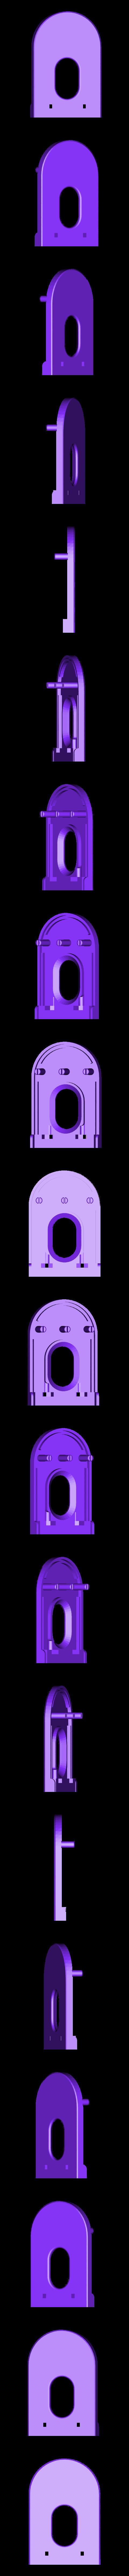 Hanger_Facade_001a.STL Download free STL file Wobble Fish! • 3D printing model, Tarnliare